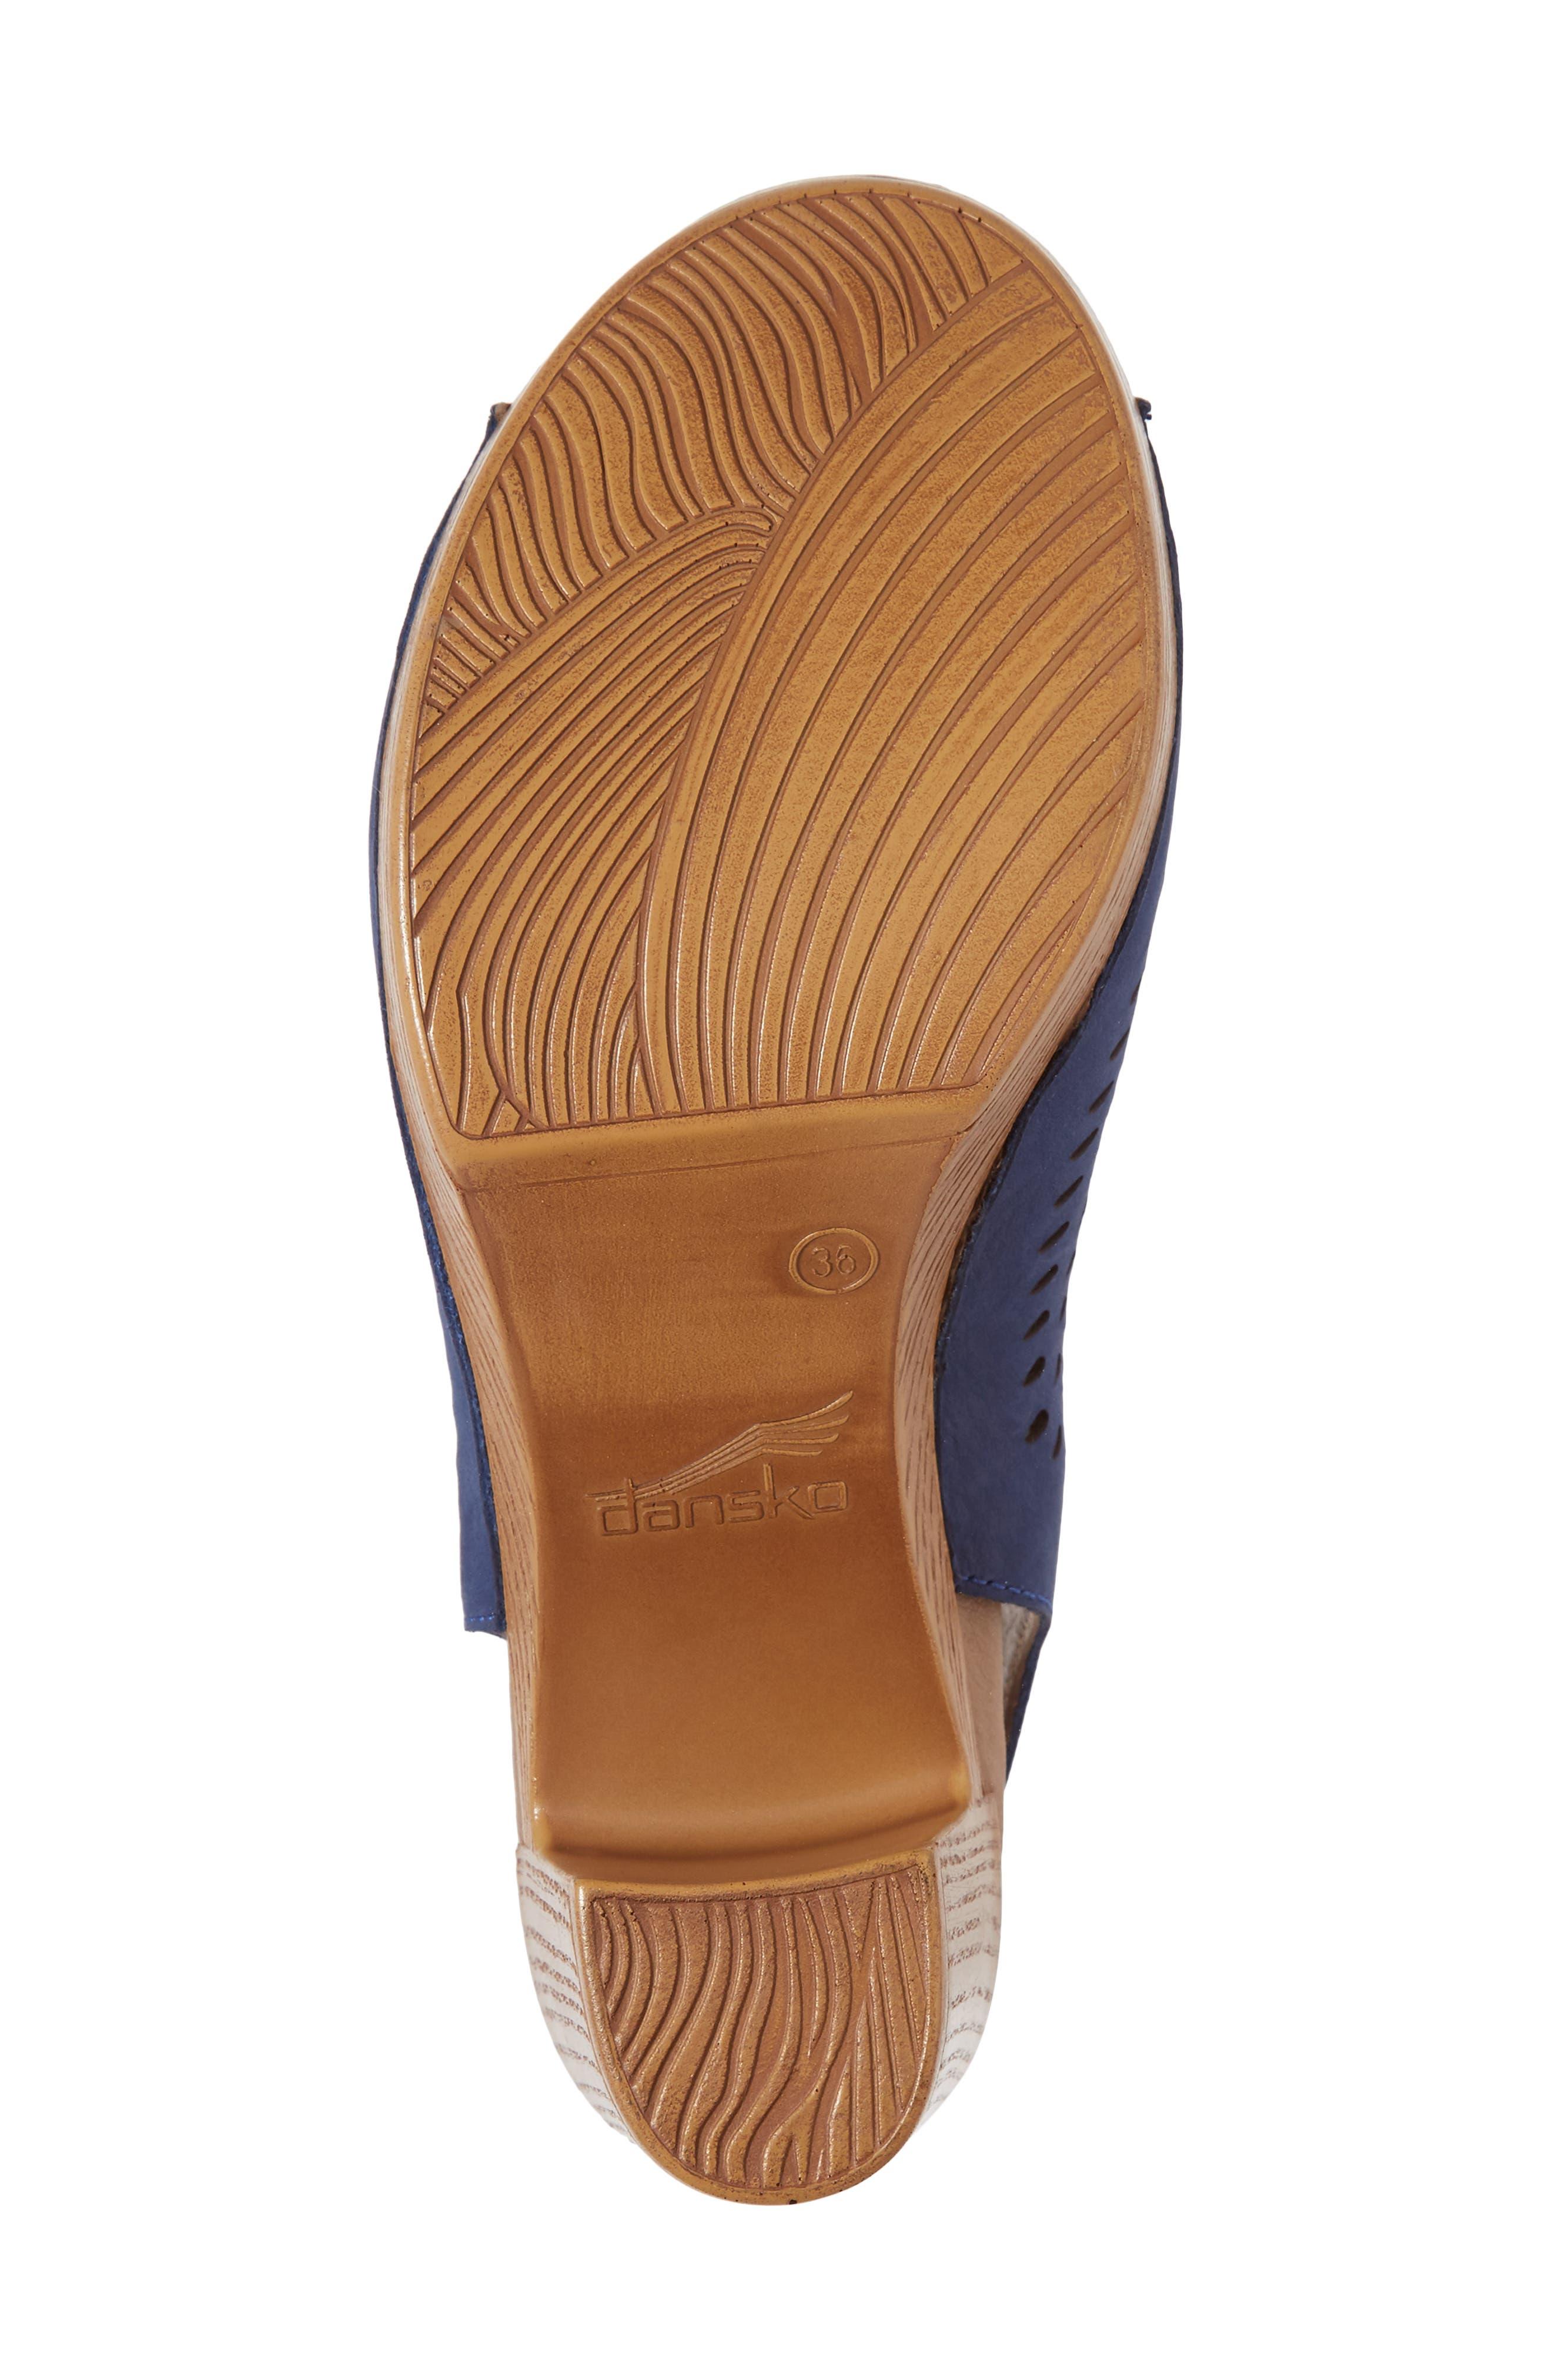 Danae Block Heel Sandal,                             Alternate thumbnail 6, color,                             Blue Milled Nubuck Leather